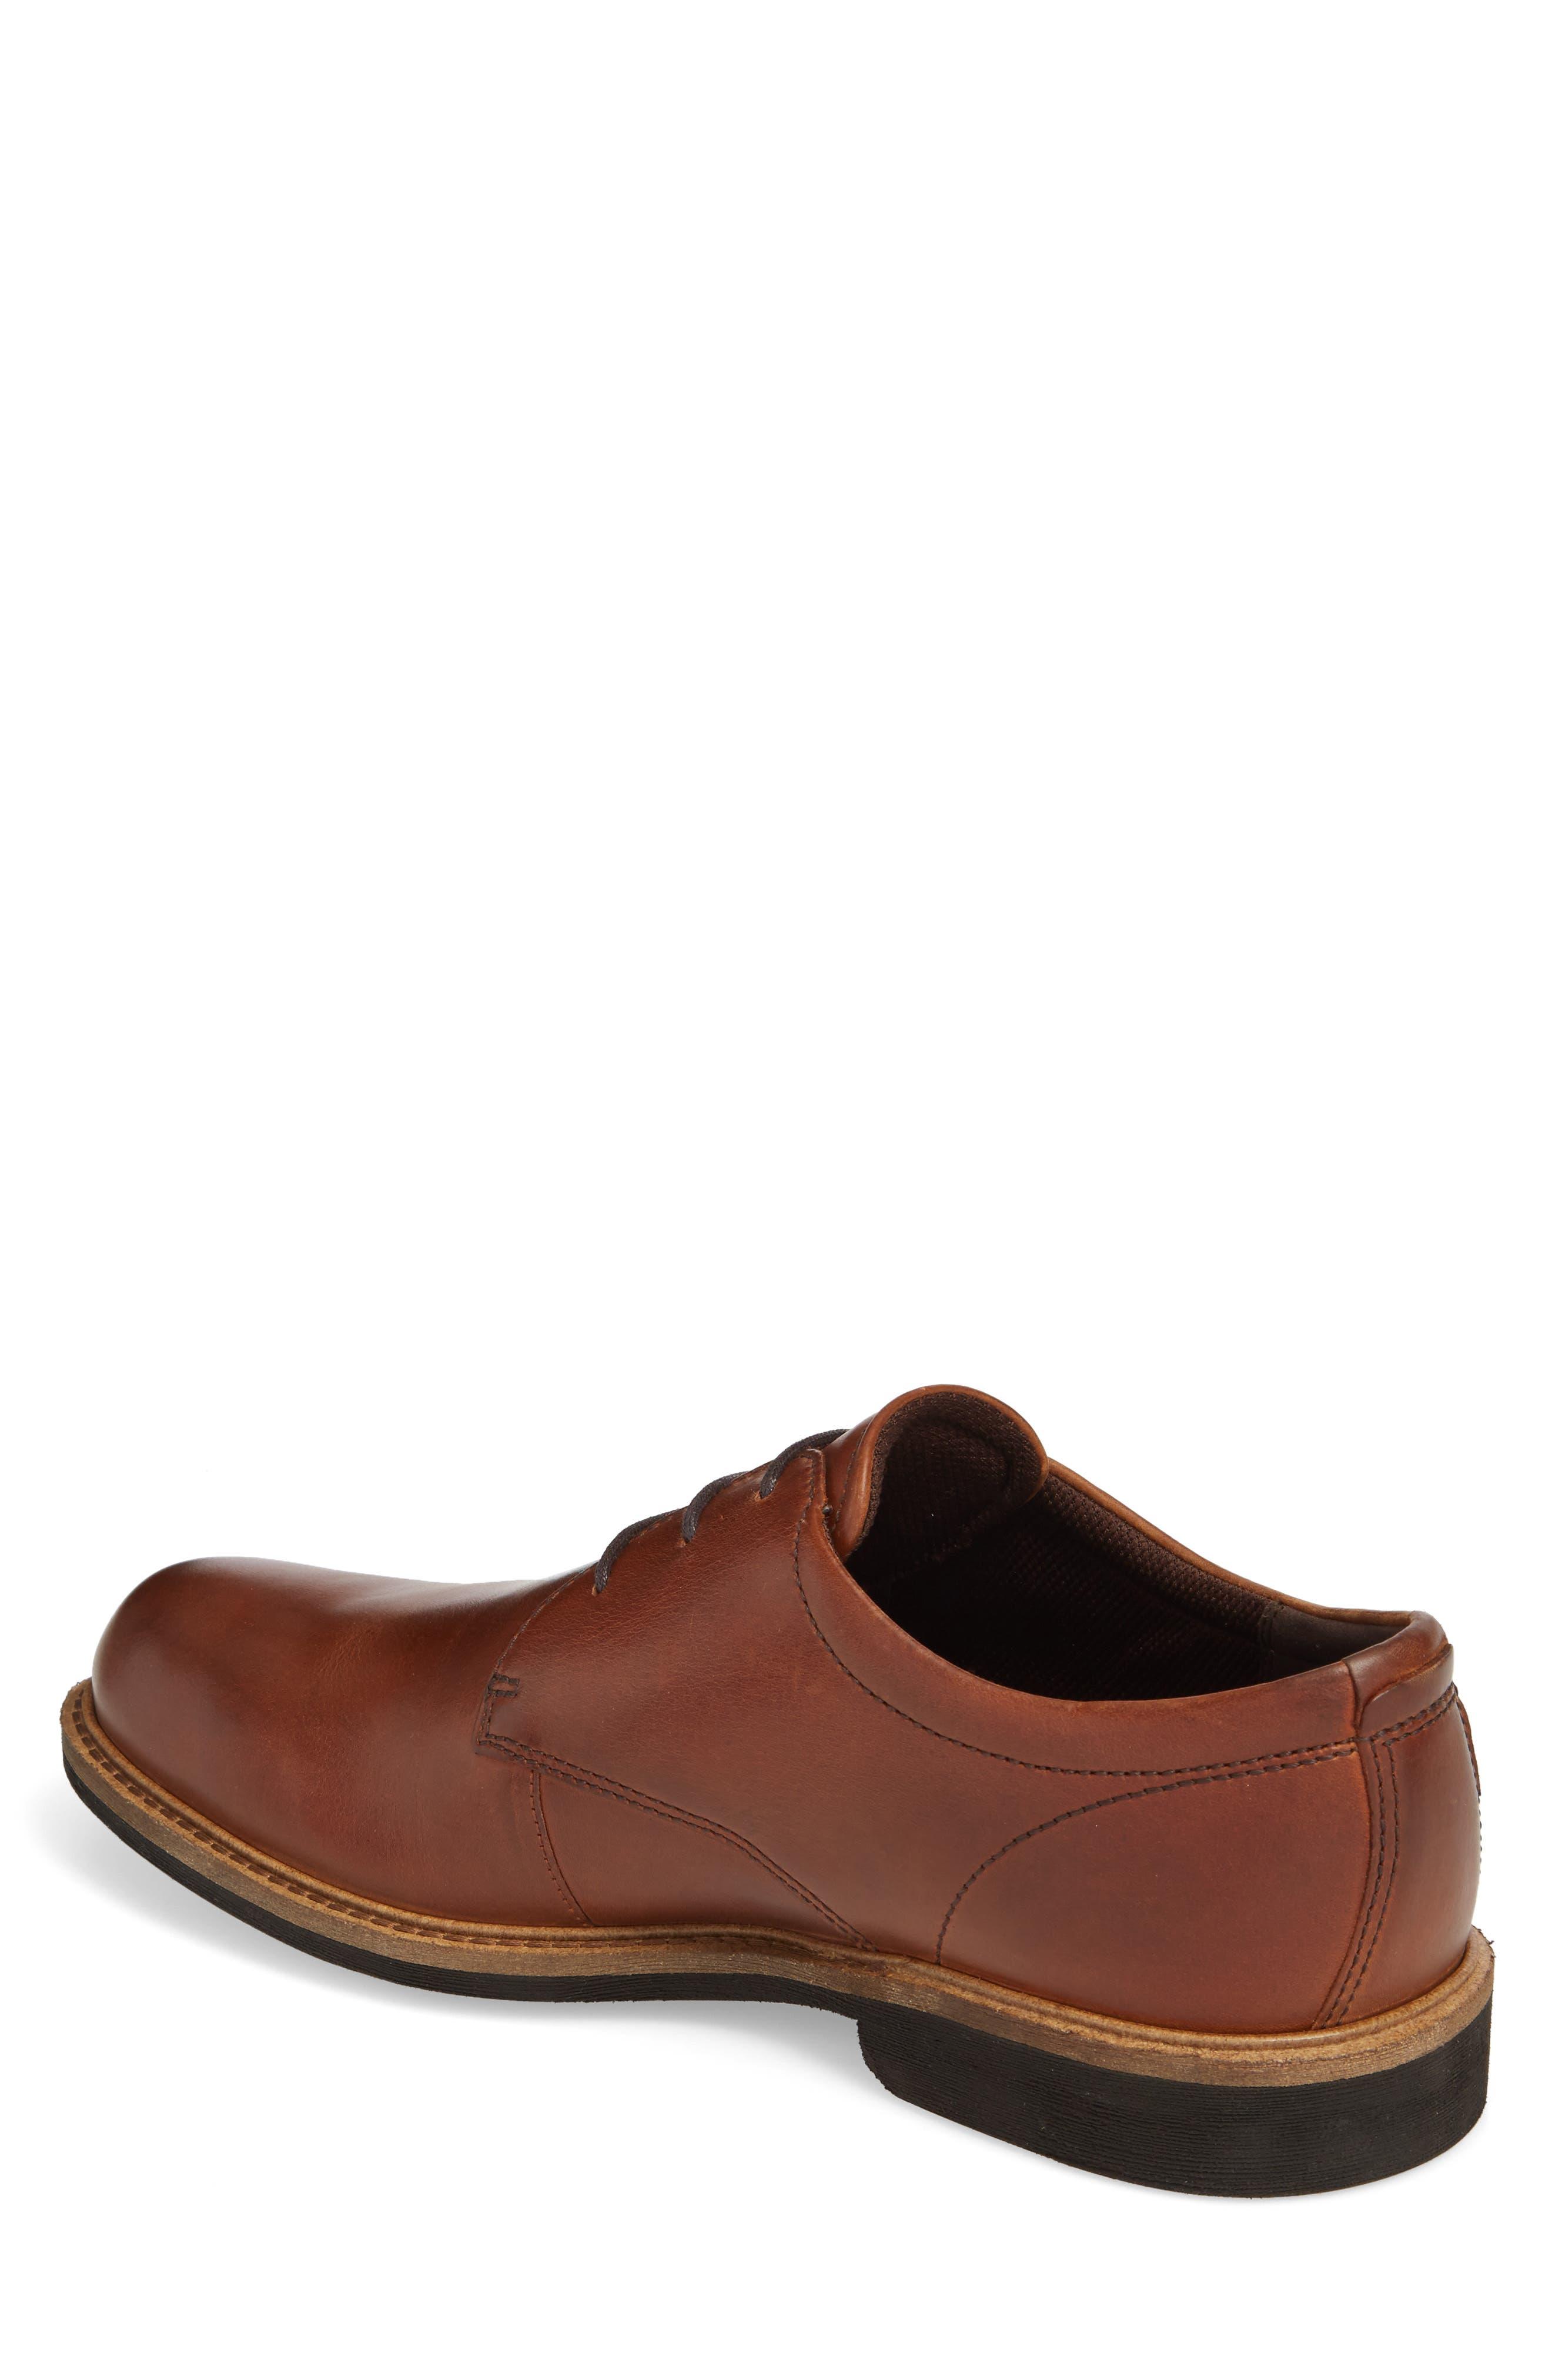 Findlay Plain Toe Derby,                             Alternate thumbnail 2, color,                             Cognac Leather